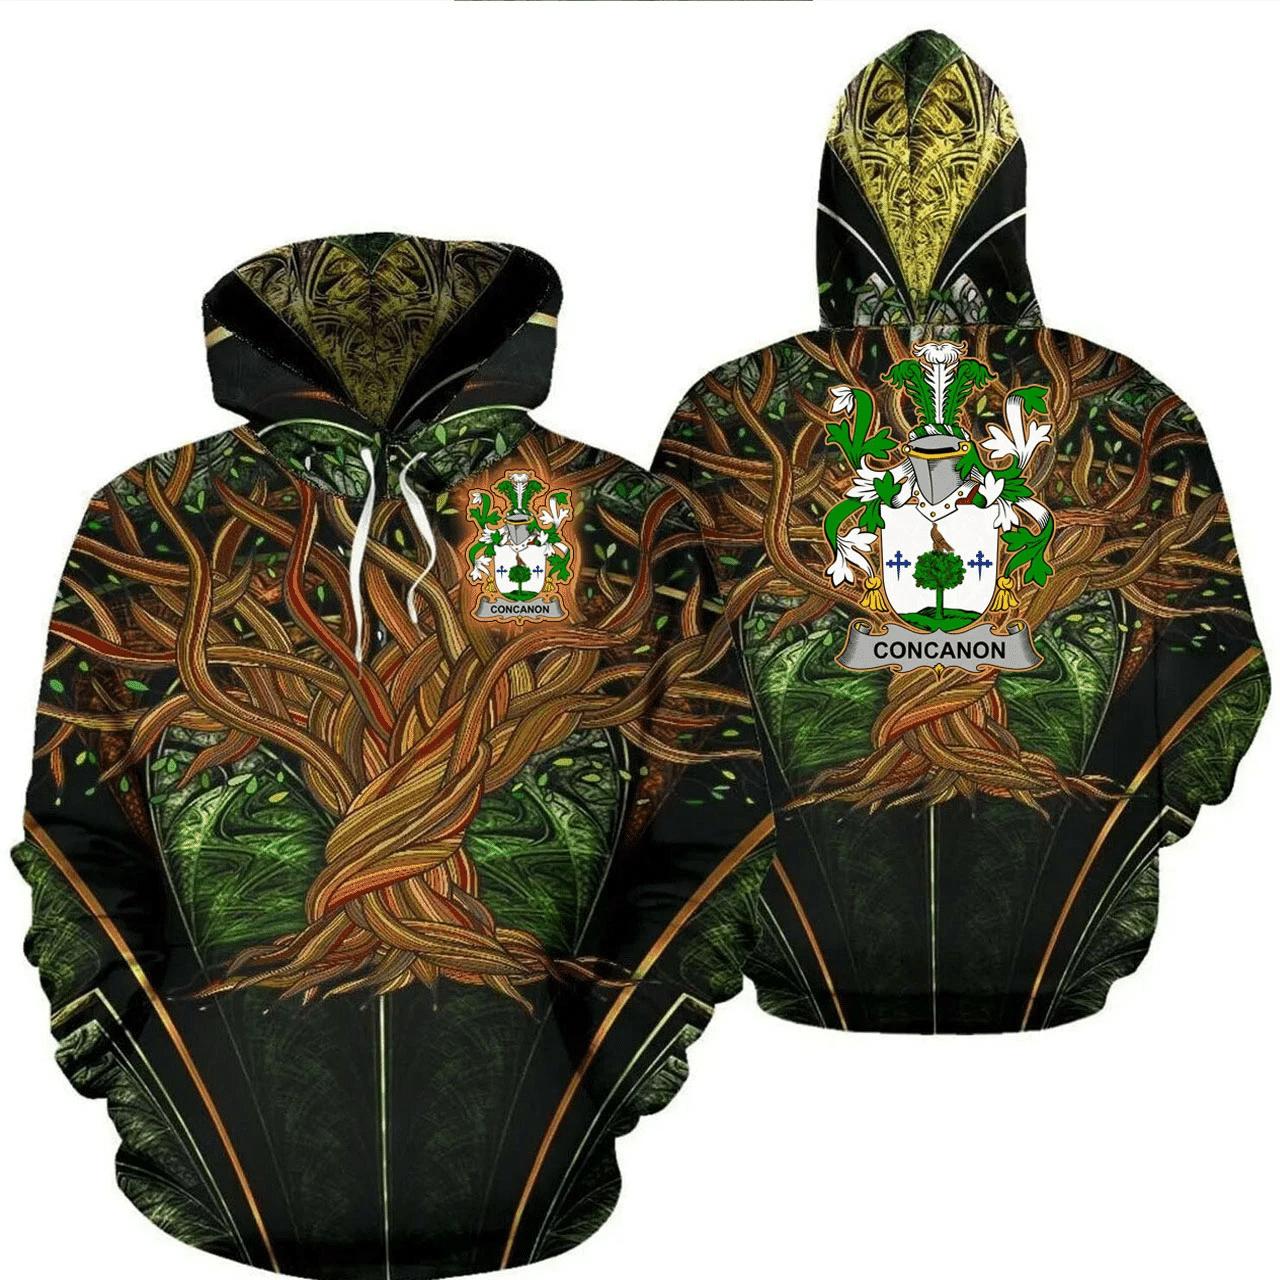 1stIreland Ireland Hoodie - Concanon or O'Concanon Irish Family Crest Hoodie - Tree Of Life A7